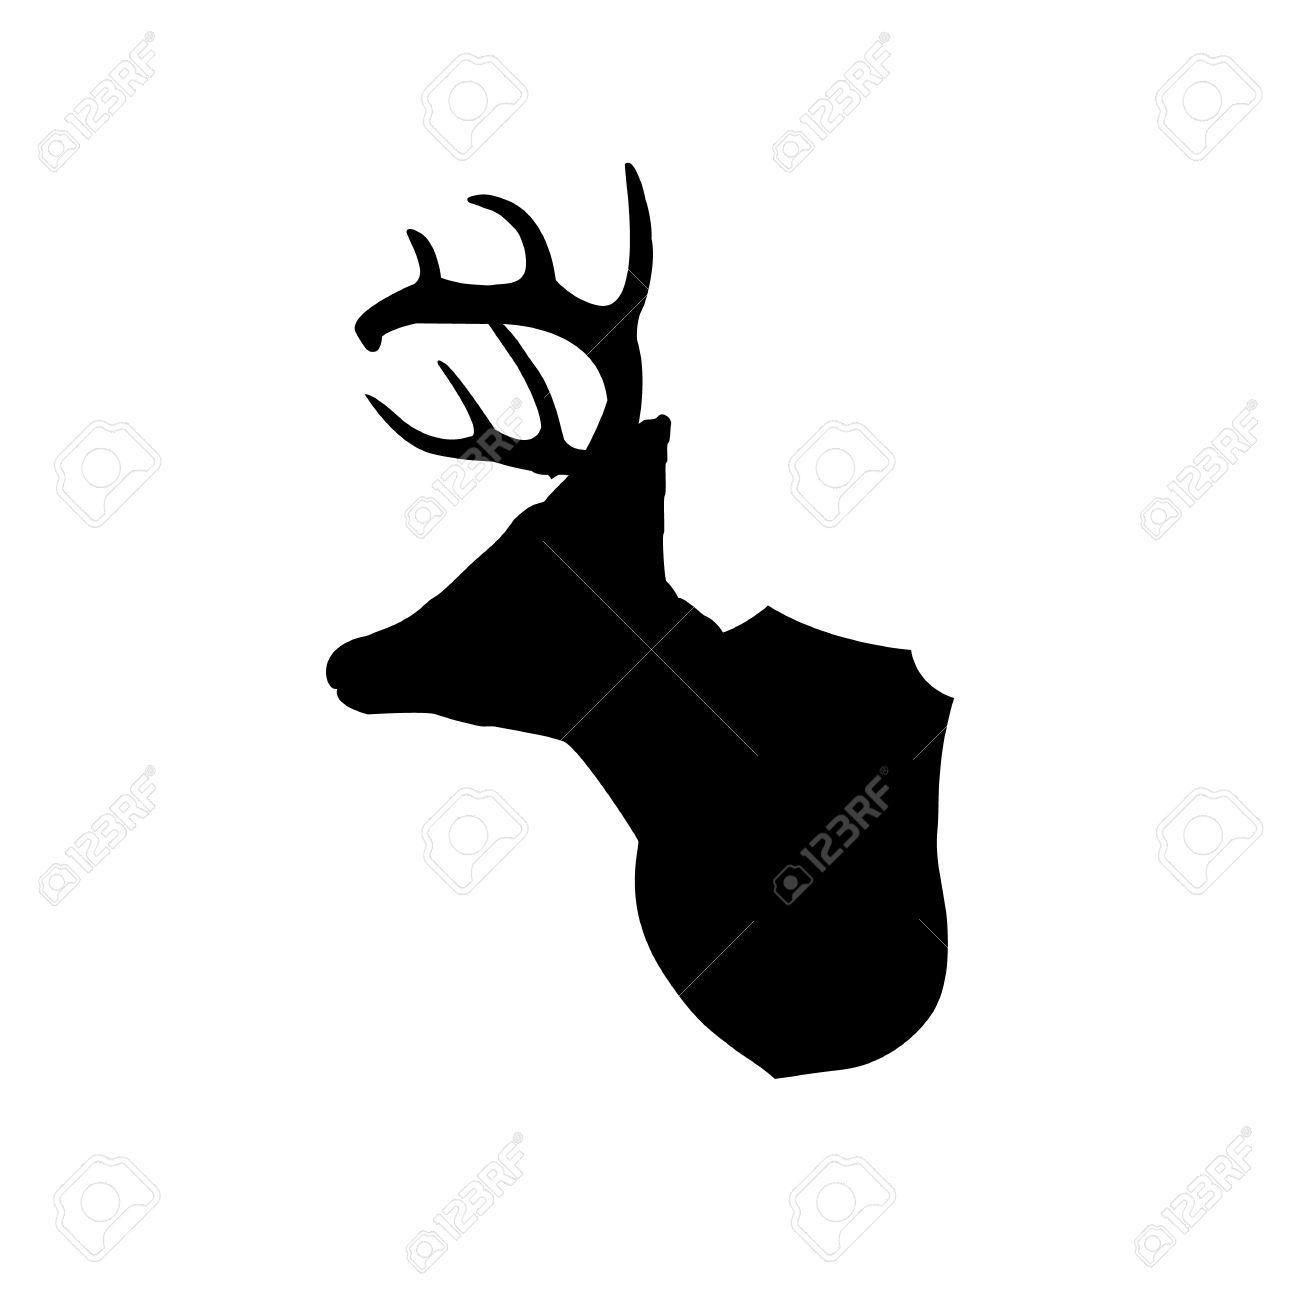 mounted deer head silhouette clip art royalty free cliparts vectors rh 123rf com deer head clipart free deer head clip art silhouette